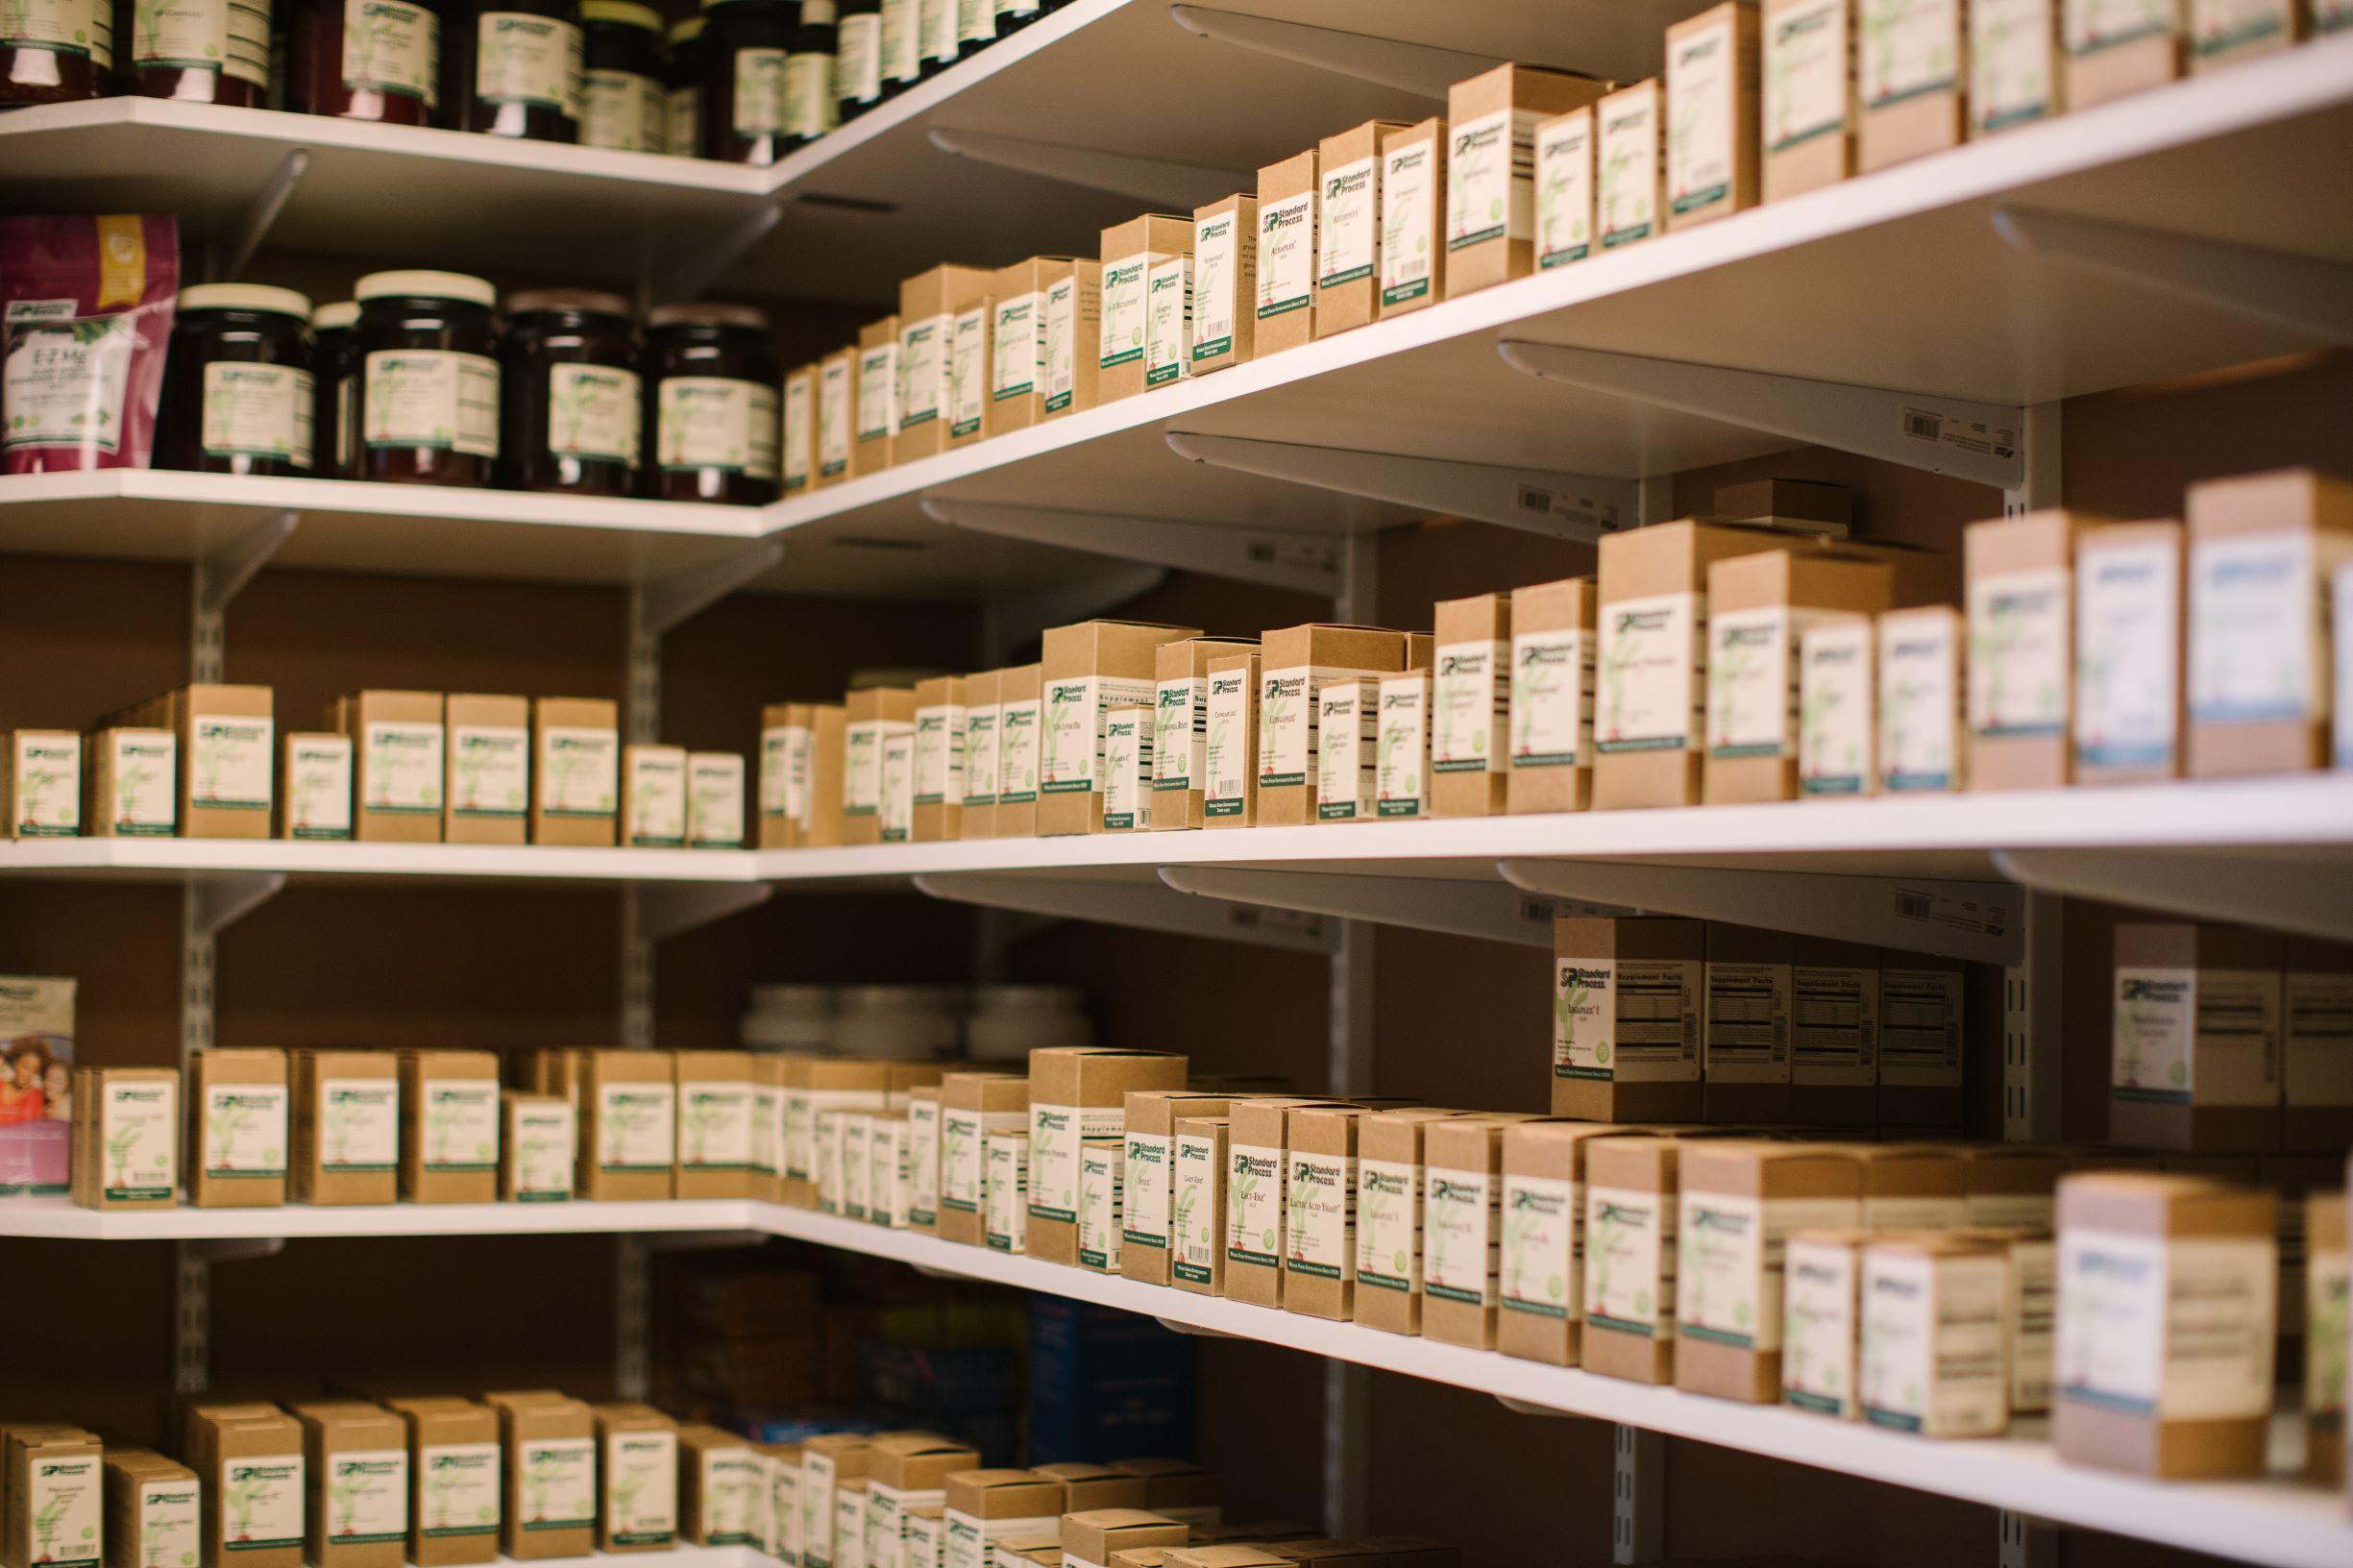 Standard process on shelves